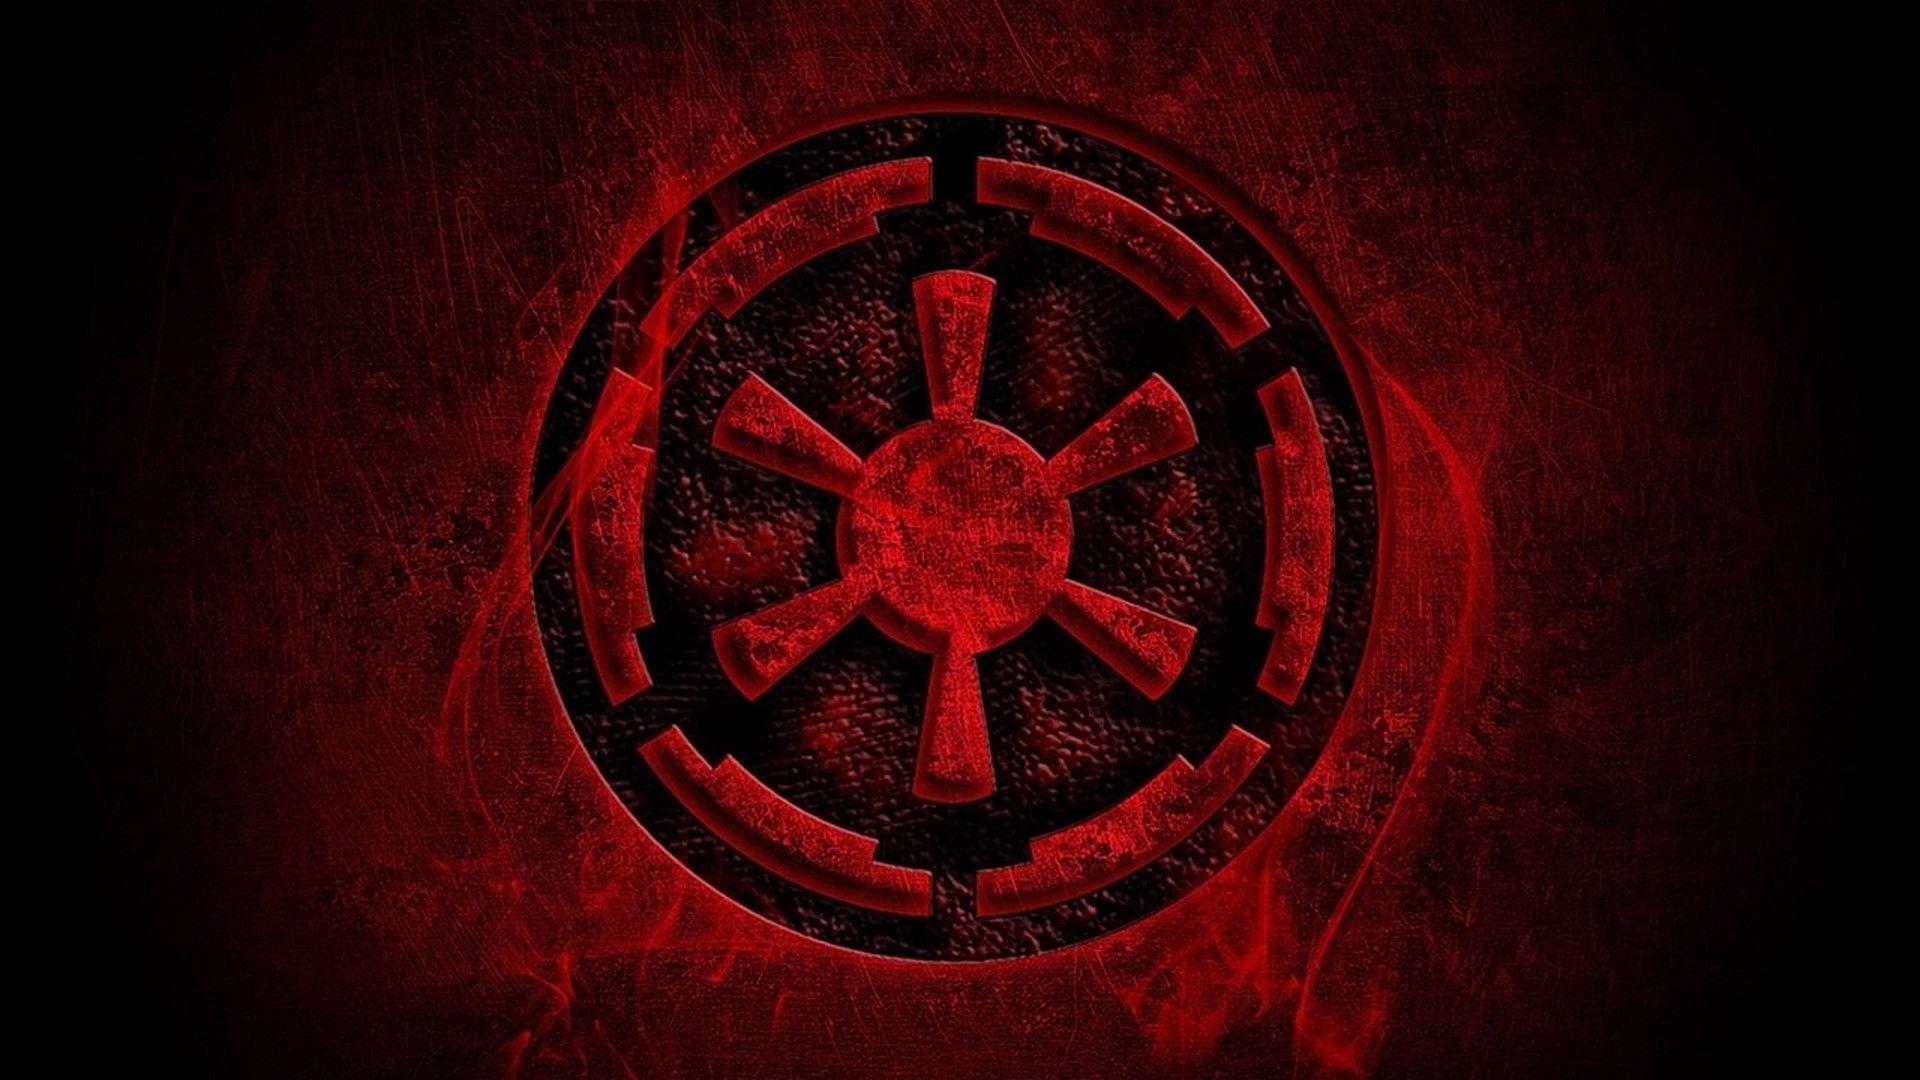 Star Wars Galactic Empire Logo Wallpaper 2021 Live Wallpaper Hd Star Wars Empire Logo Star Wars Background Star Wars Empire